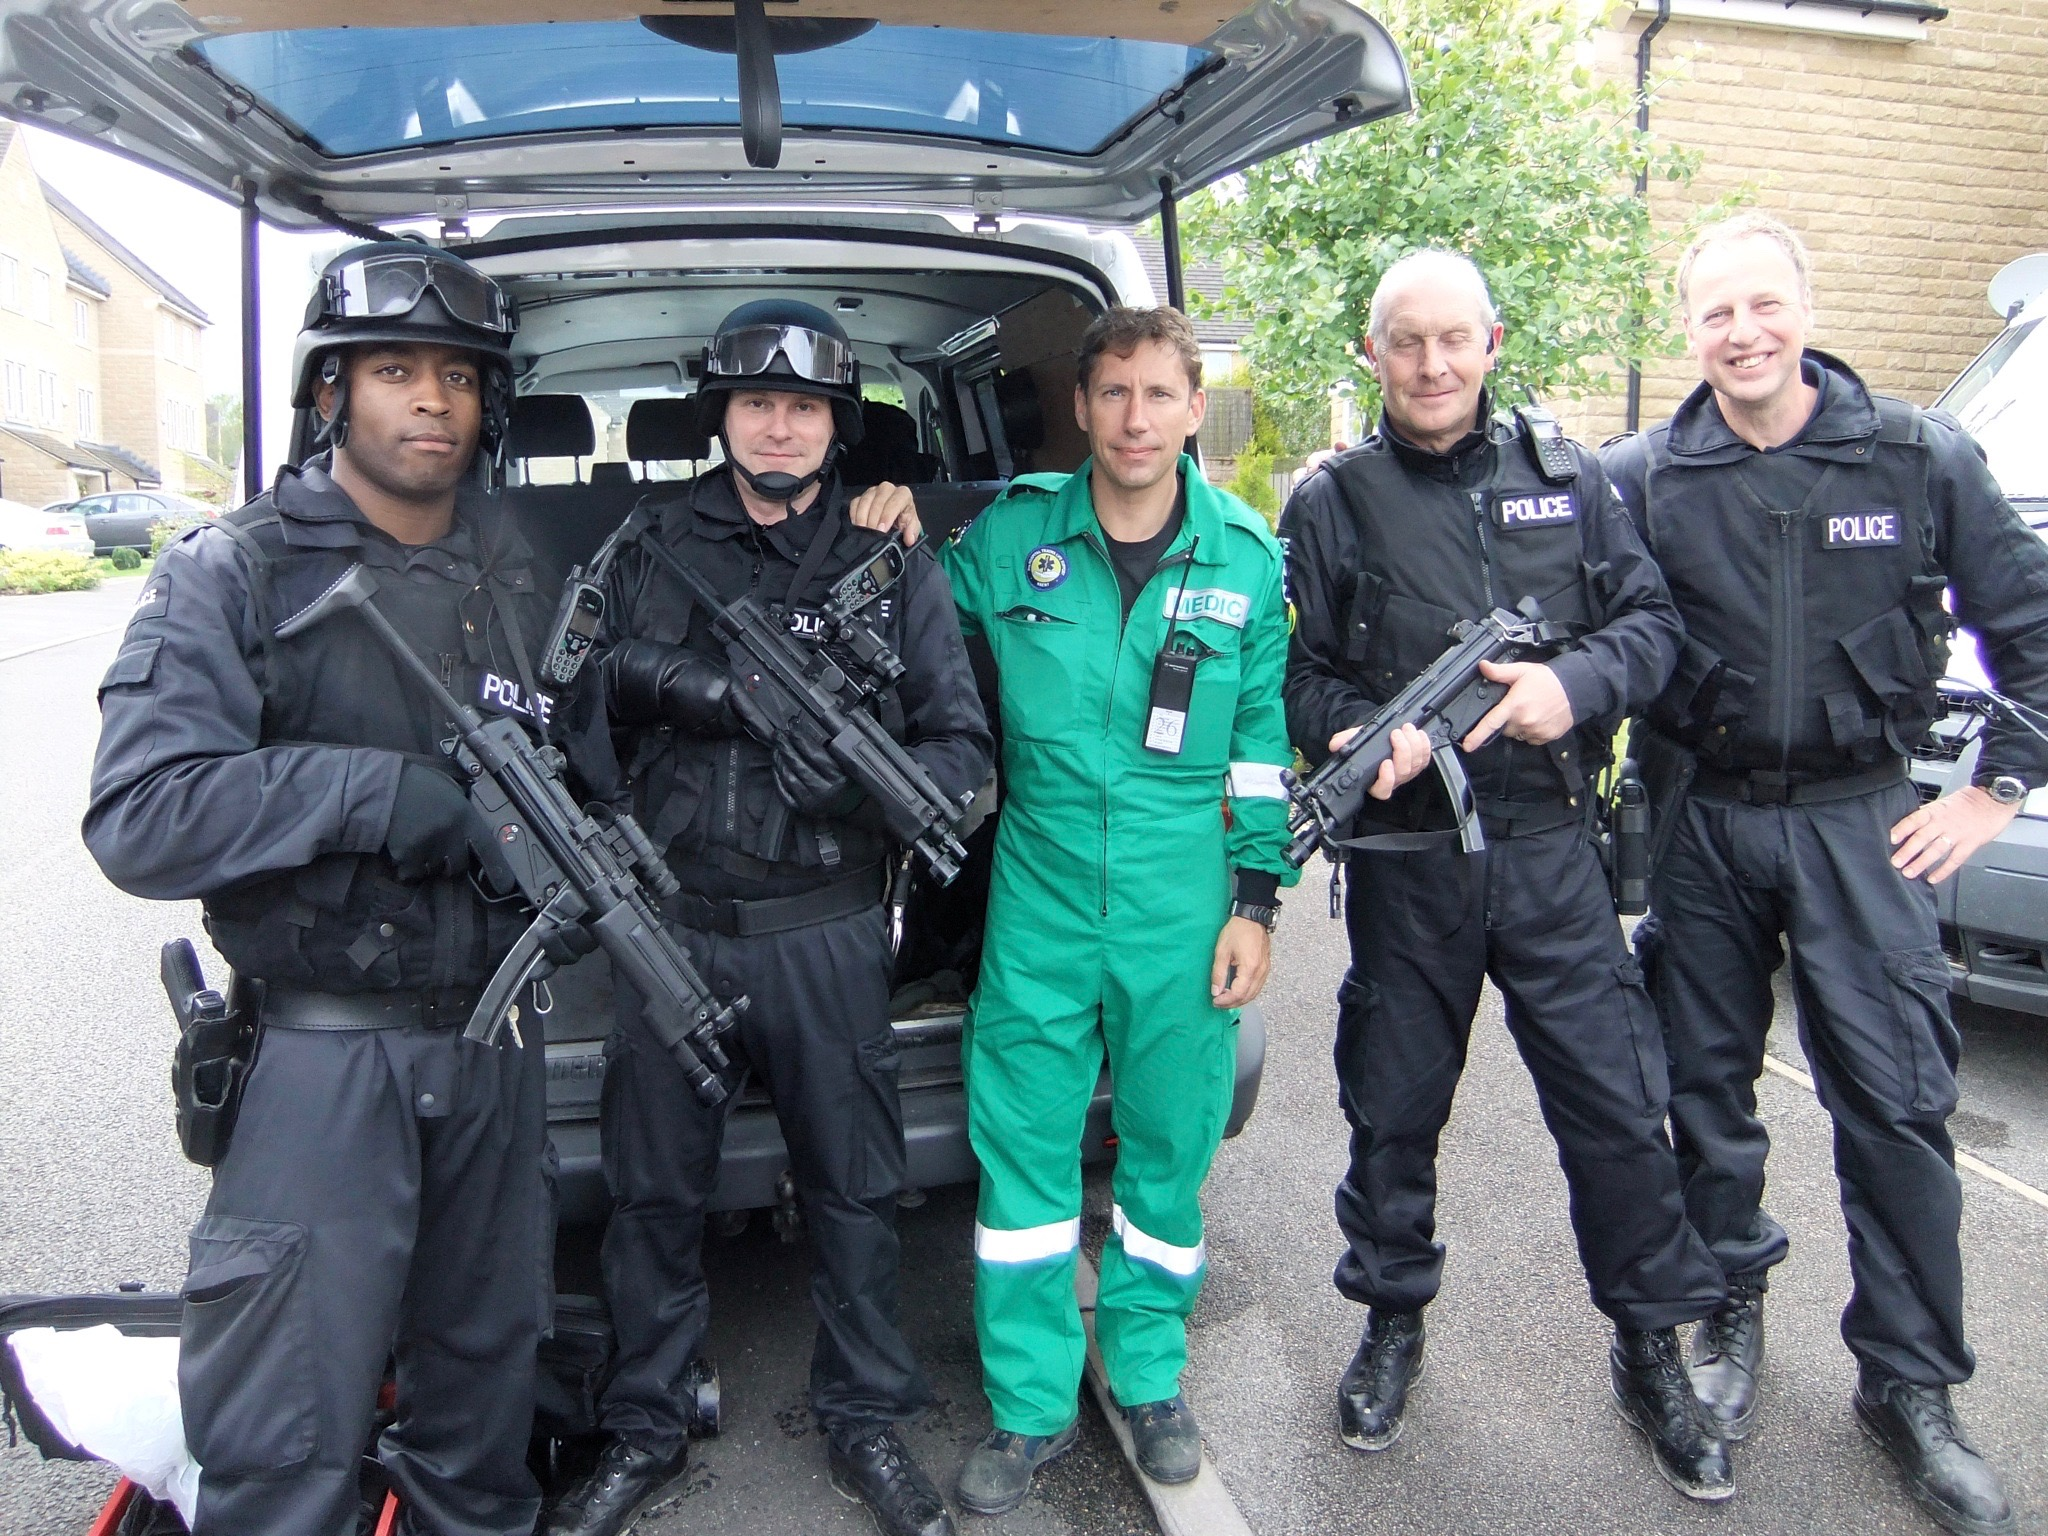 On Camera Medic & Police